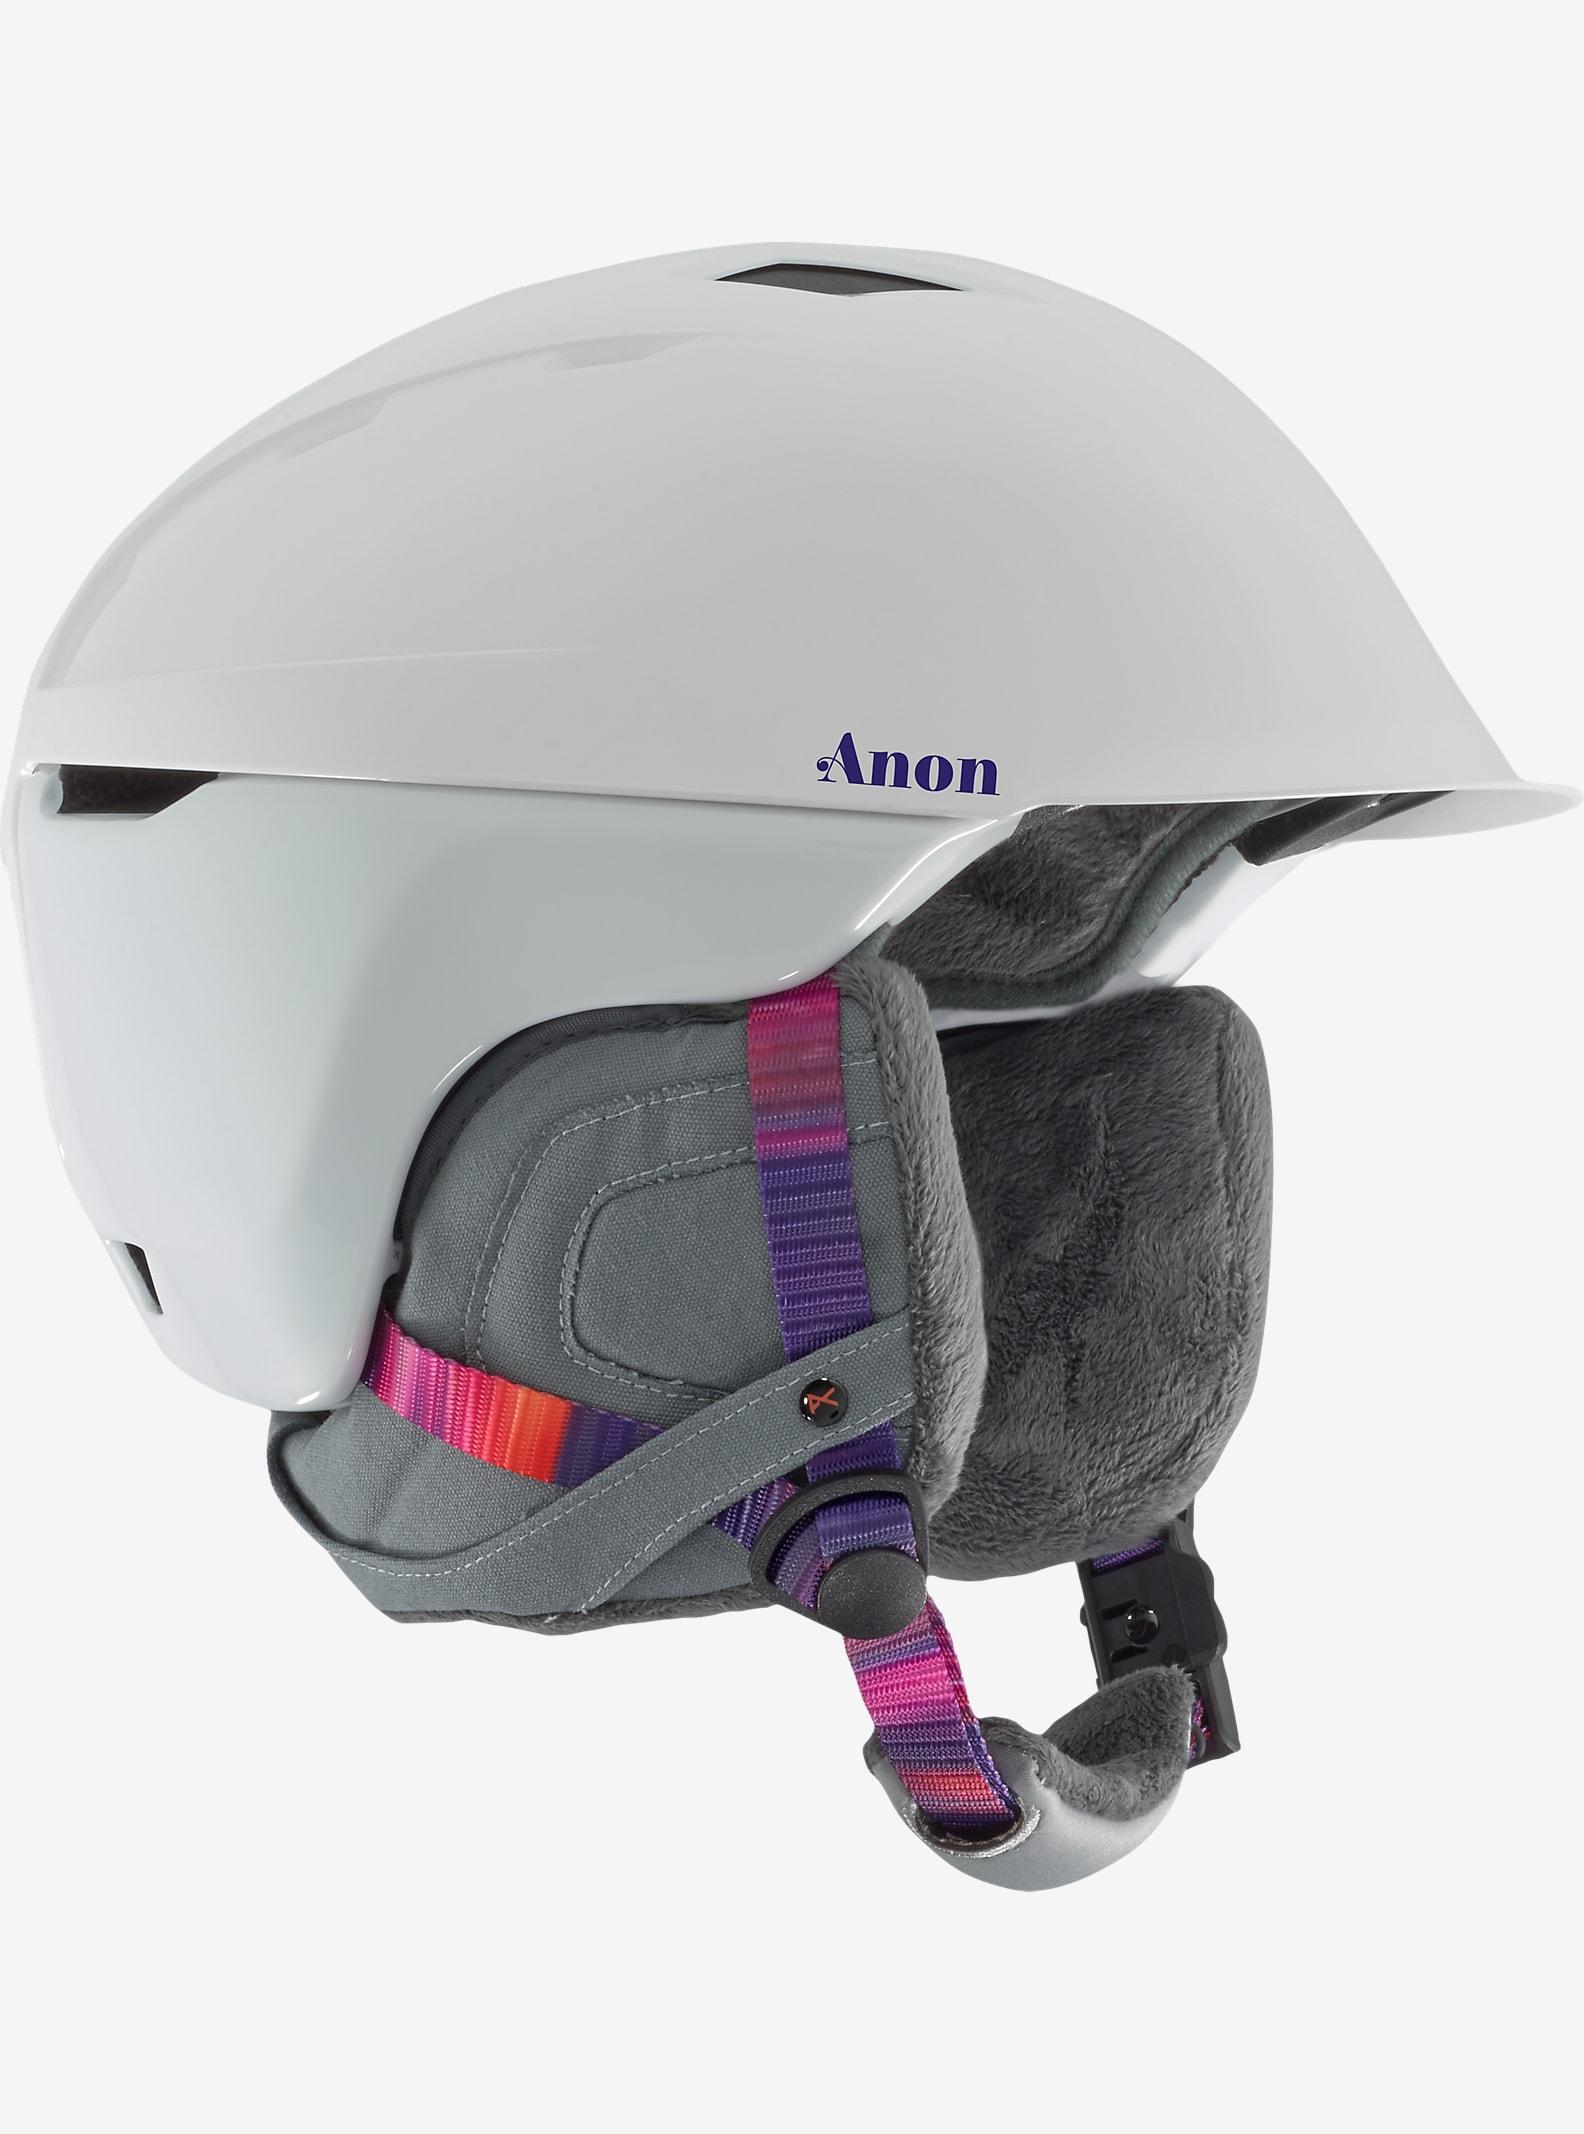 anon. Galena Helmet shown in Aura White